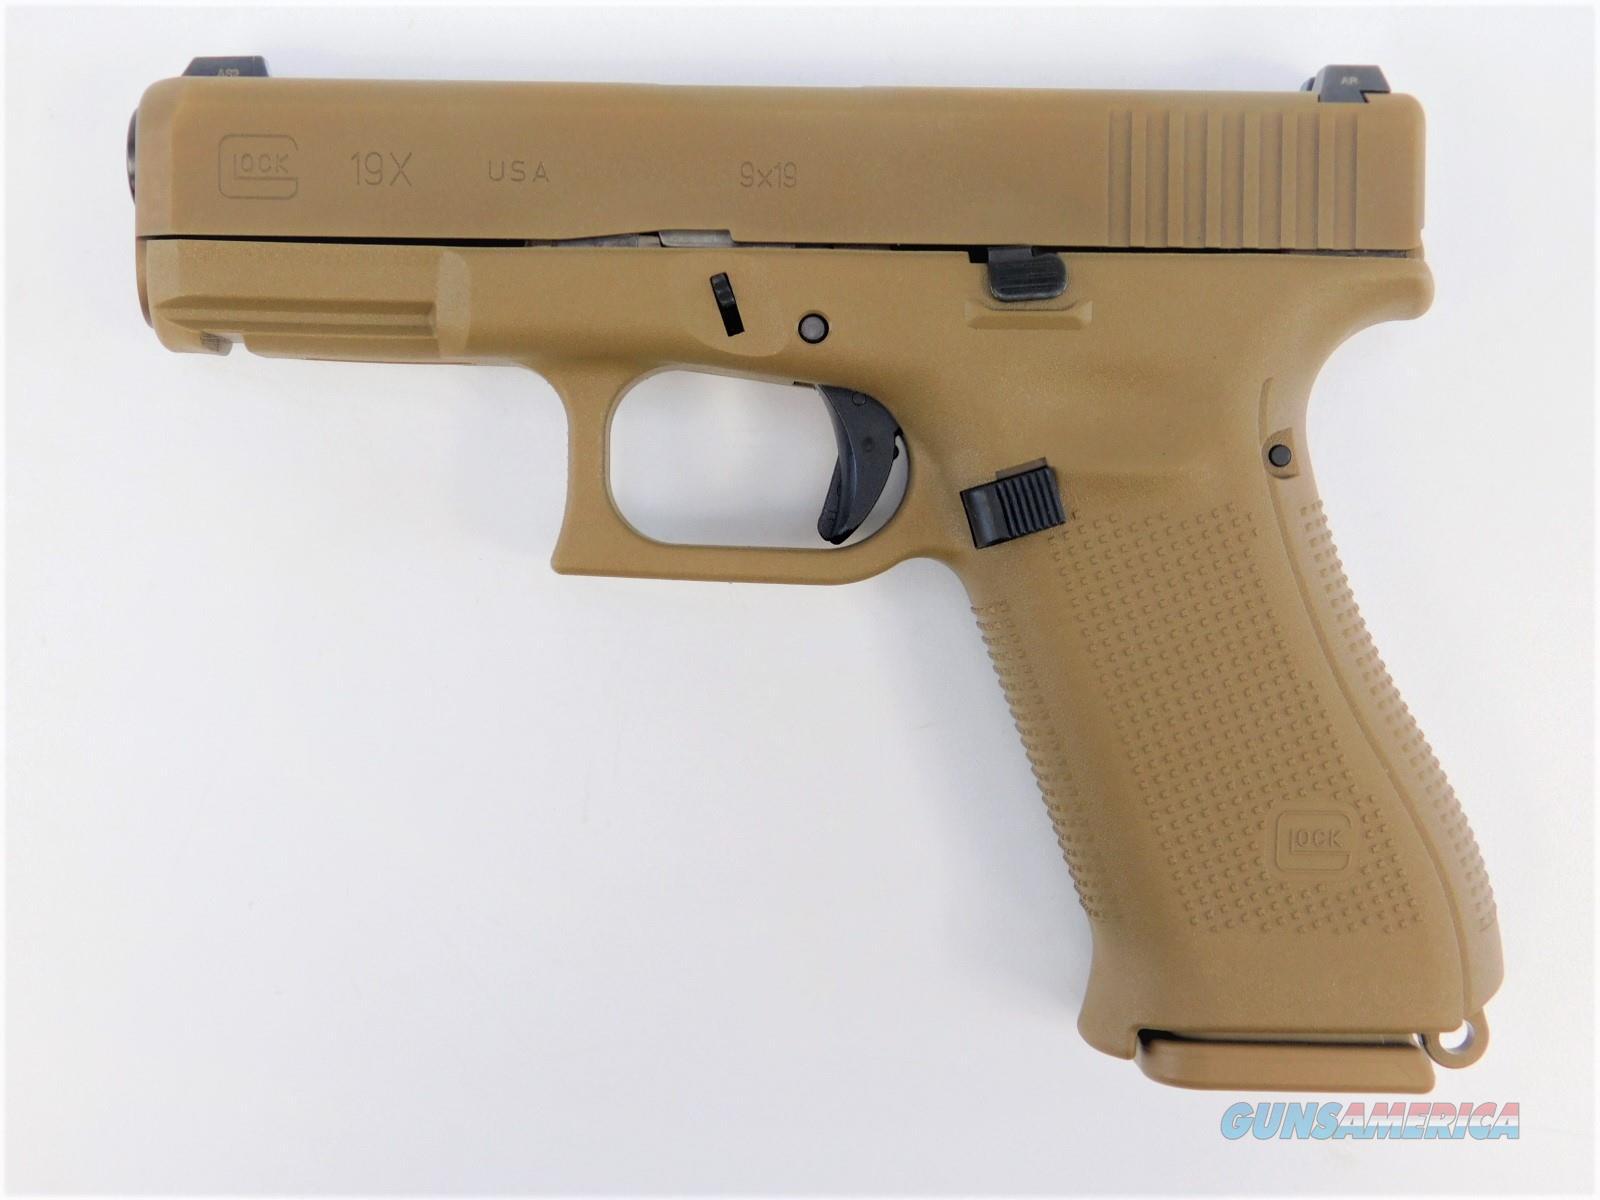 "Glock G19X Gen 5 9mm Luger 4.02"" Coyote Tan UX1950703  Guns > Pistols > Glock Pistols > 19/19X"